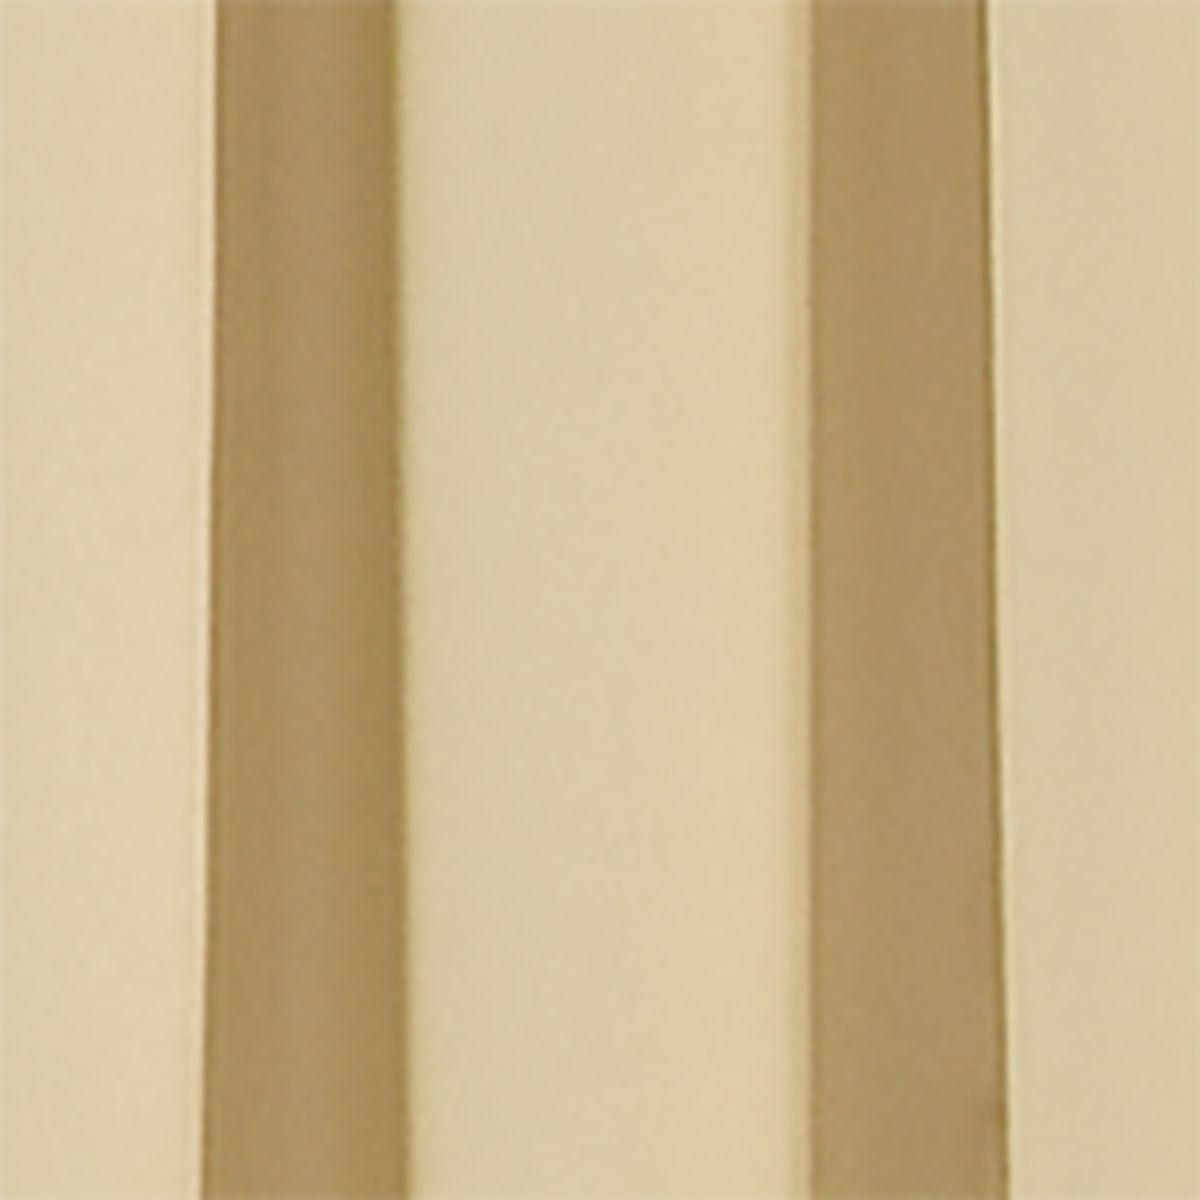 "Cotton Insulated Window Valance 40"" x 15"""